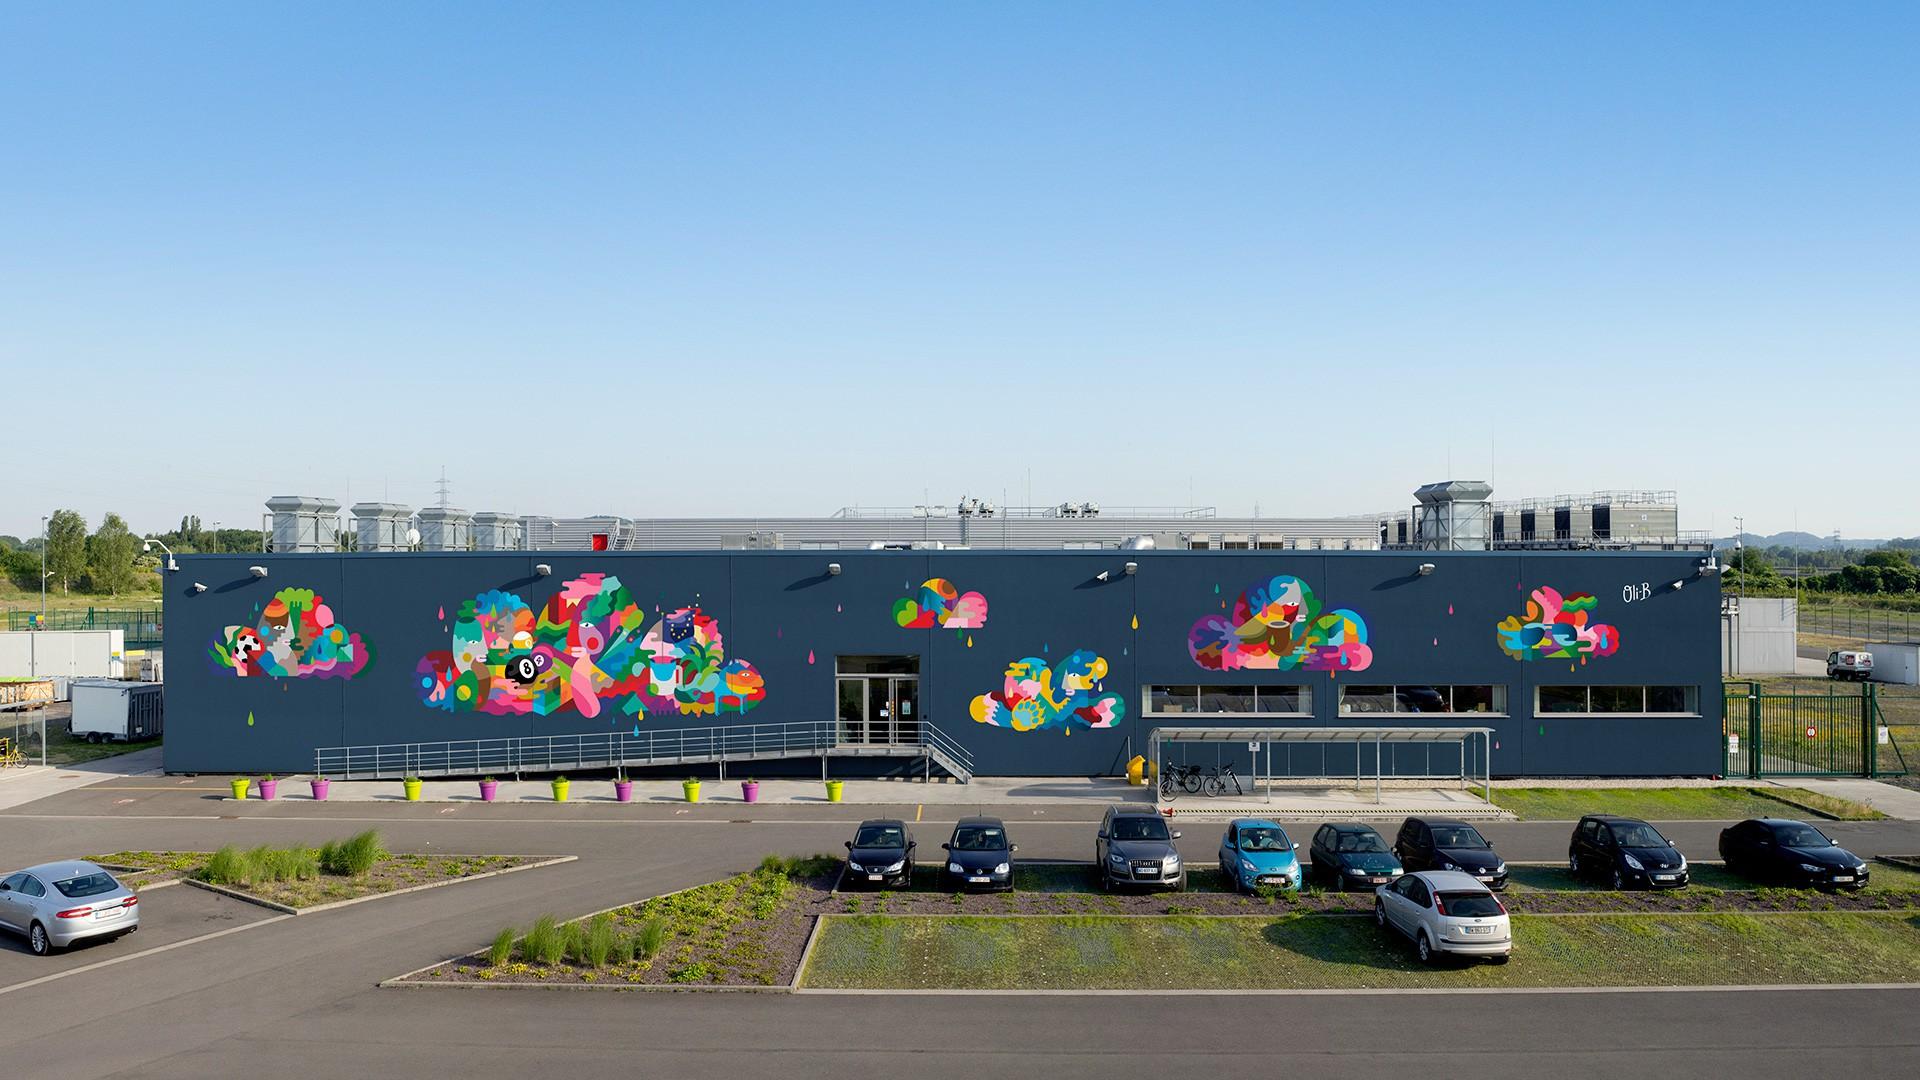 Data Center Mural Project